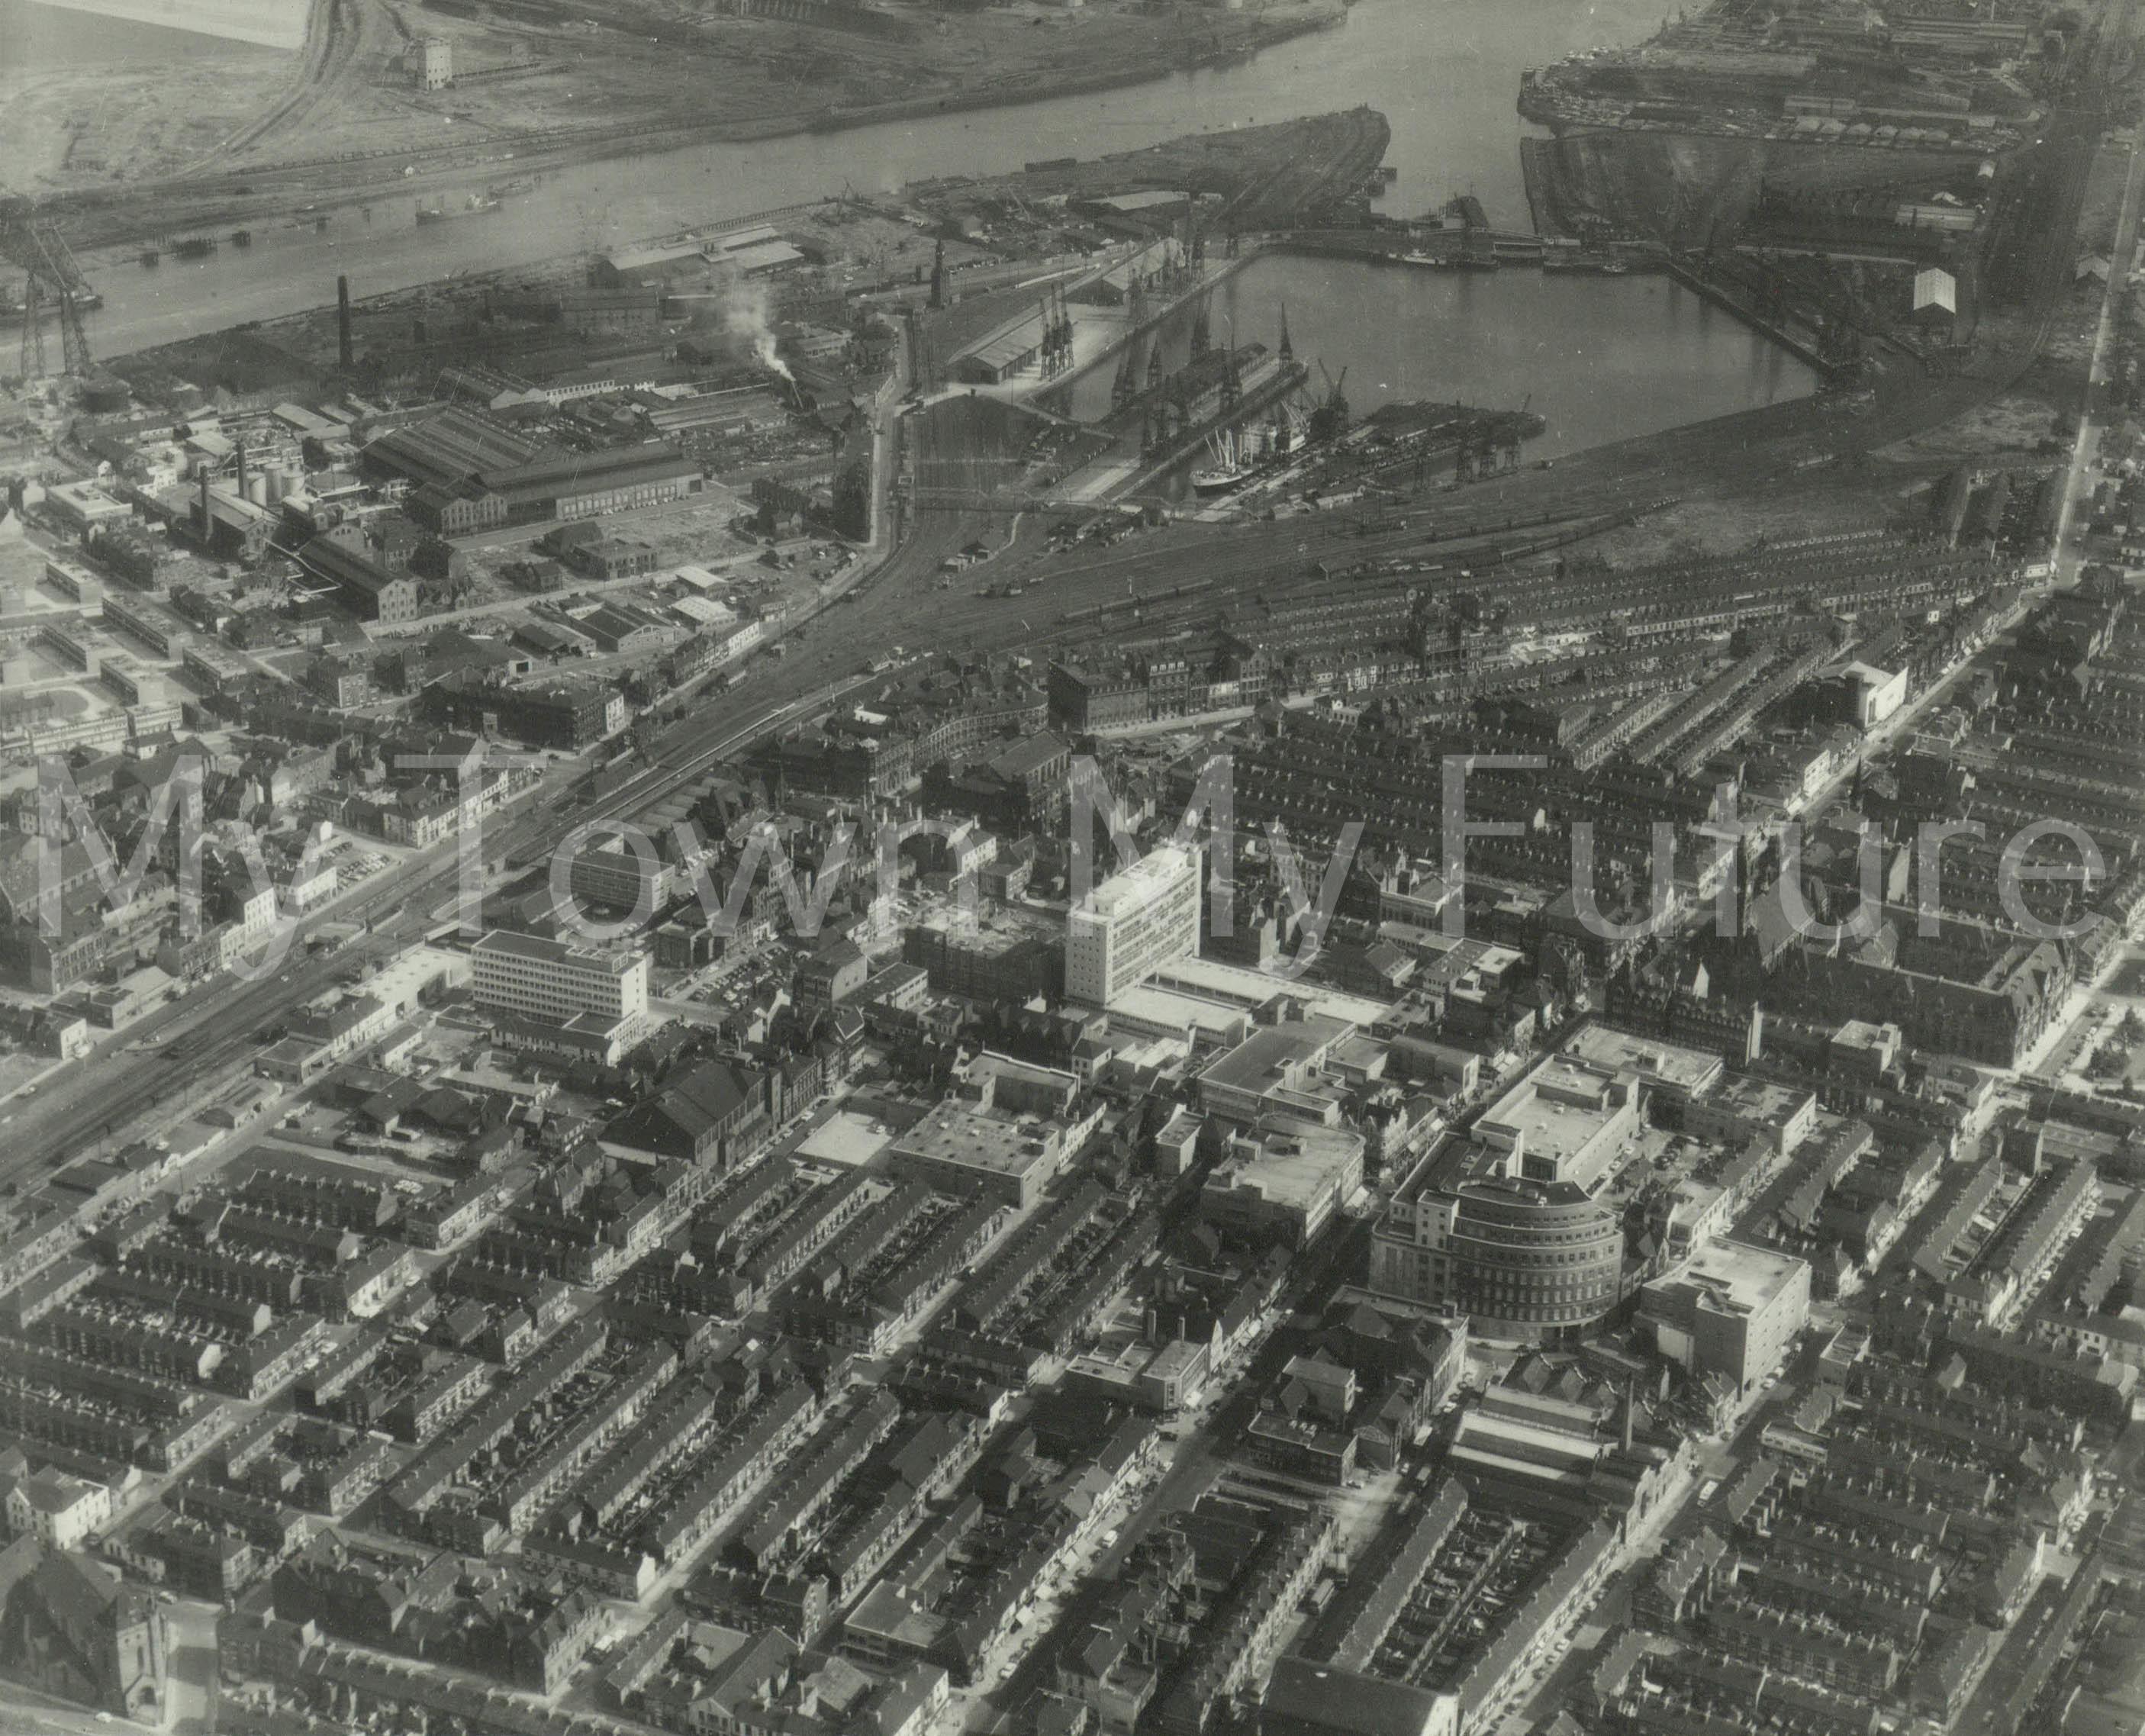 Middlesbrough Town Centre & Docks 1965